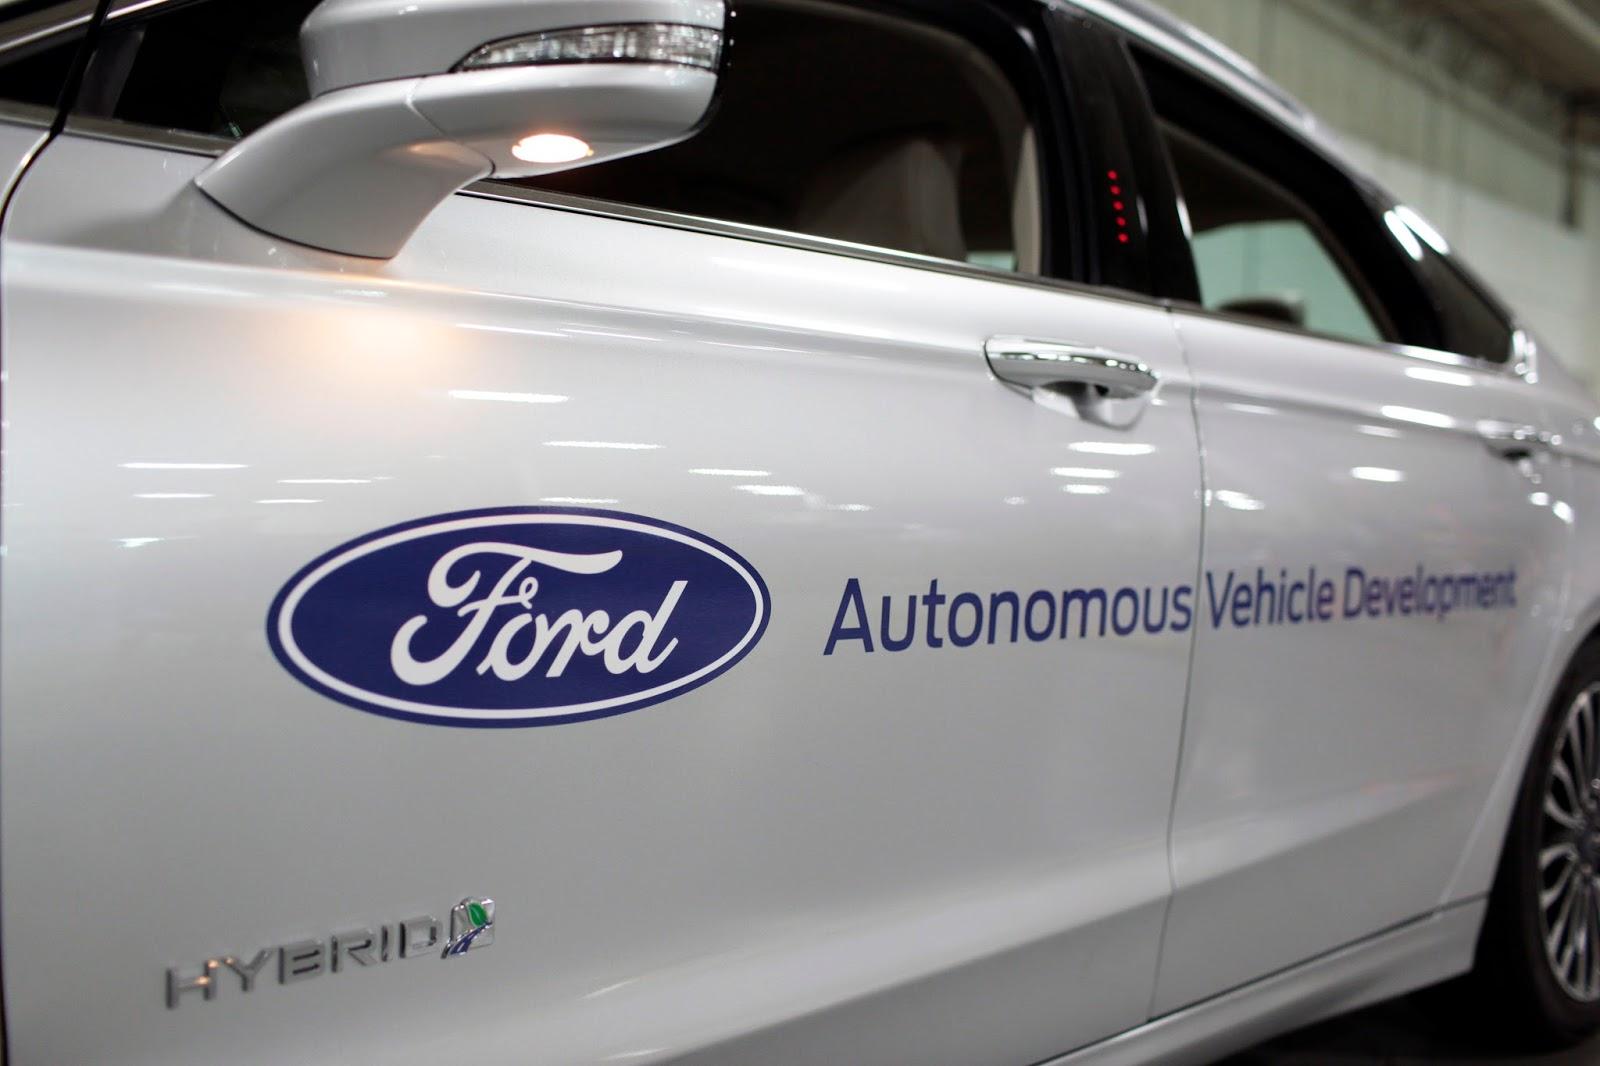 MB 95012B2 Η Ford 1η στην εξέλιξη της αυτόνομης οδήγησης Autonomous Driving, Ford, Τεχνολογία